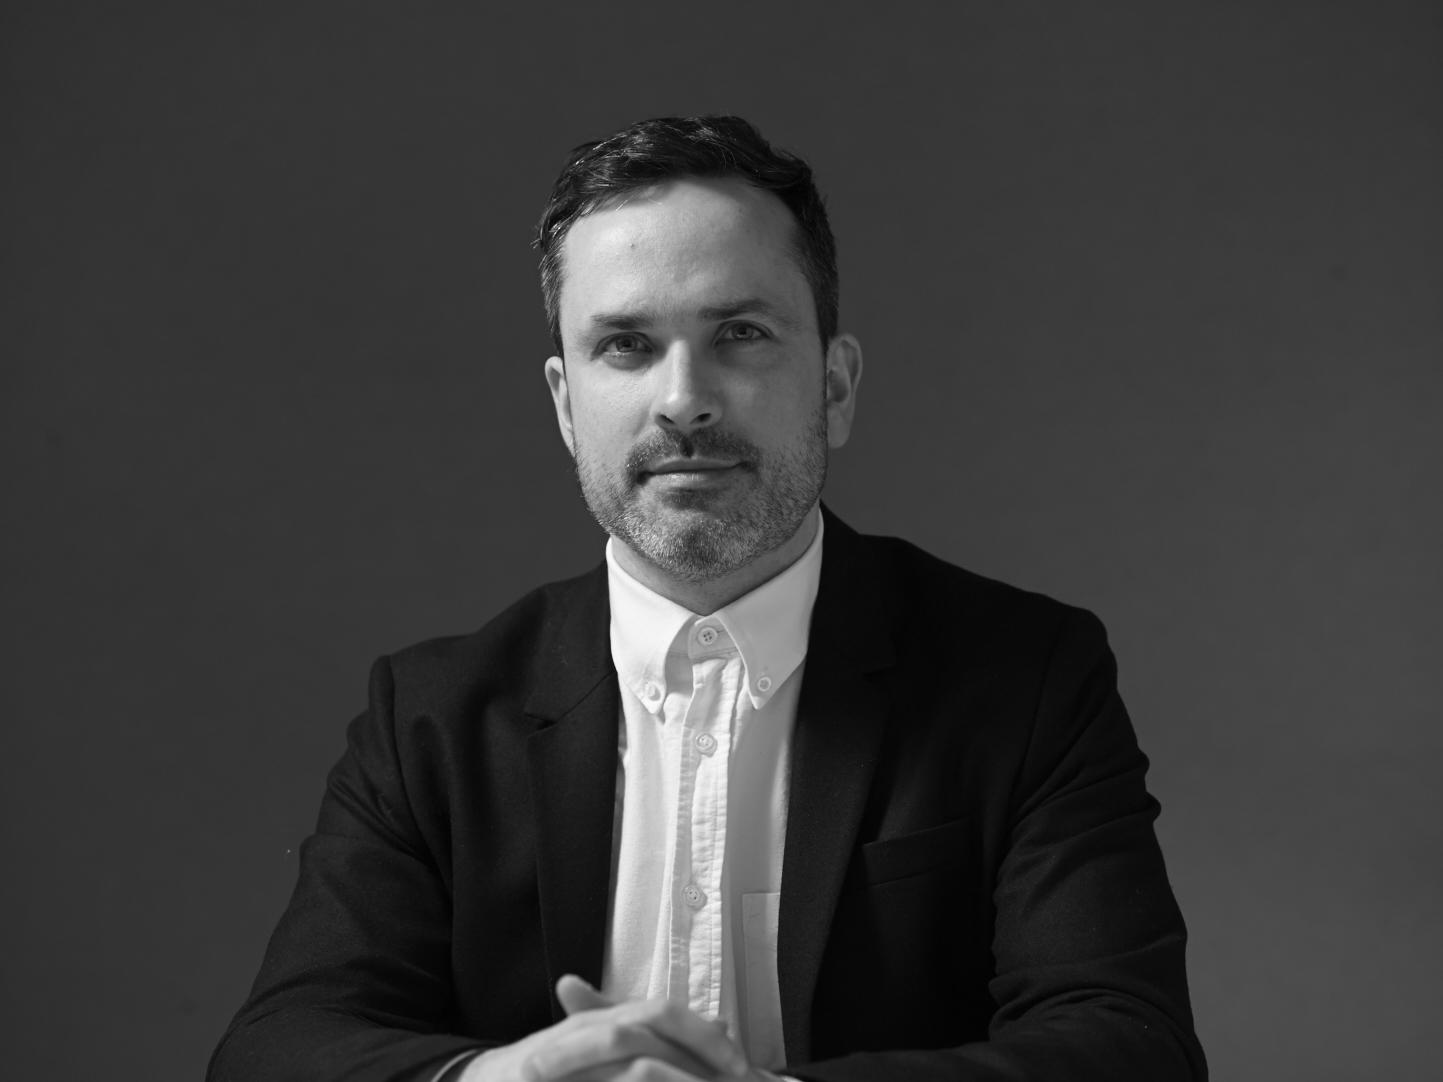 Portrait of David Wall